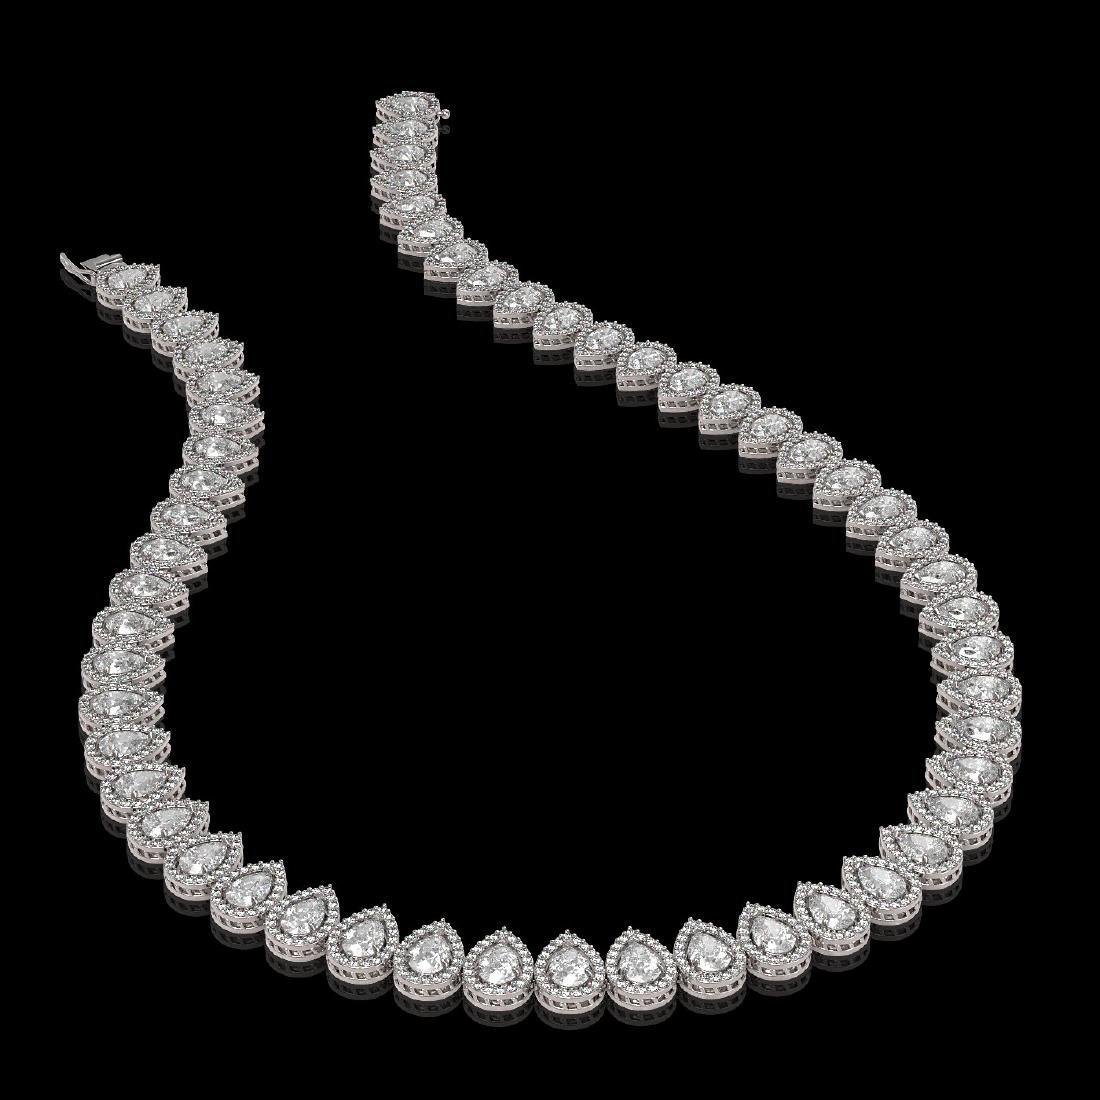 34.83 CTW Pear Diamond Designer Necklace 18K White Gold - 2